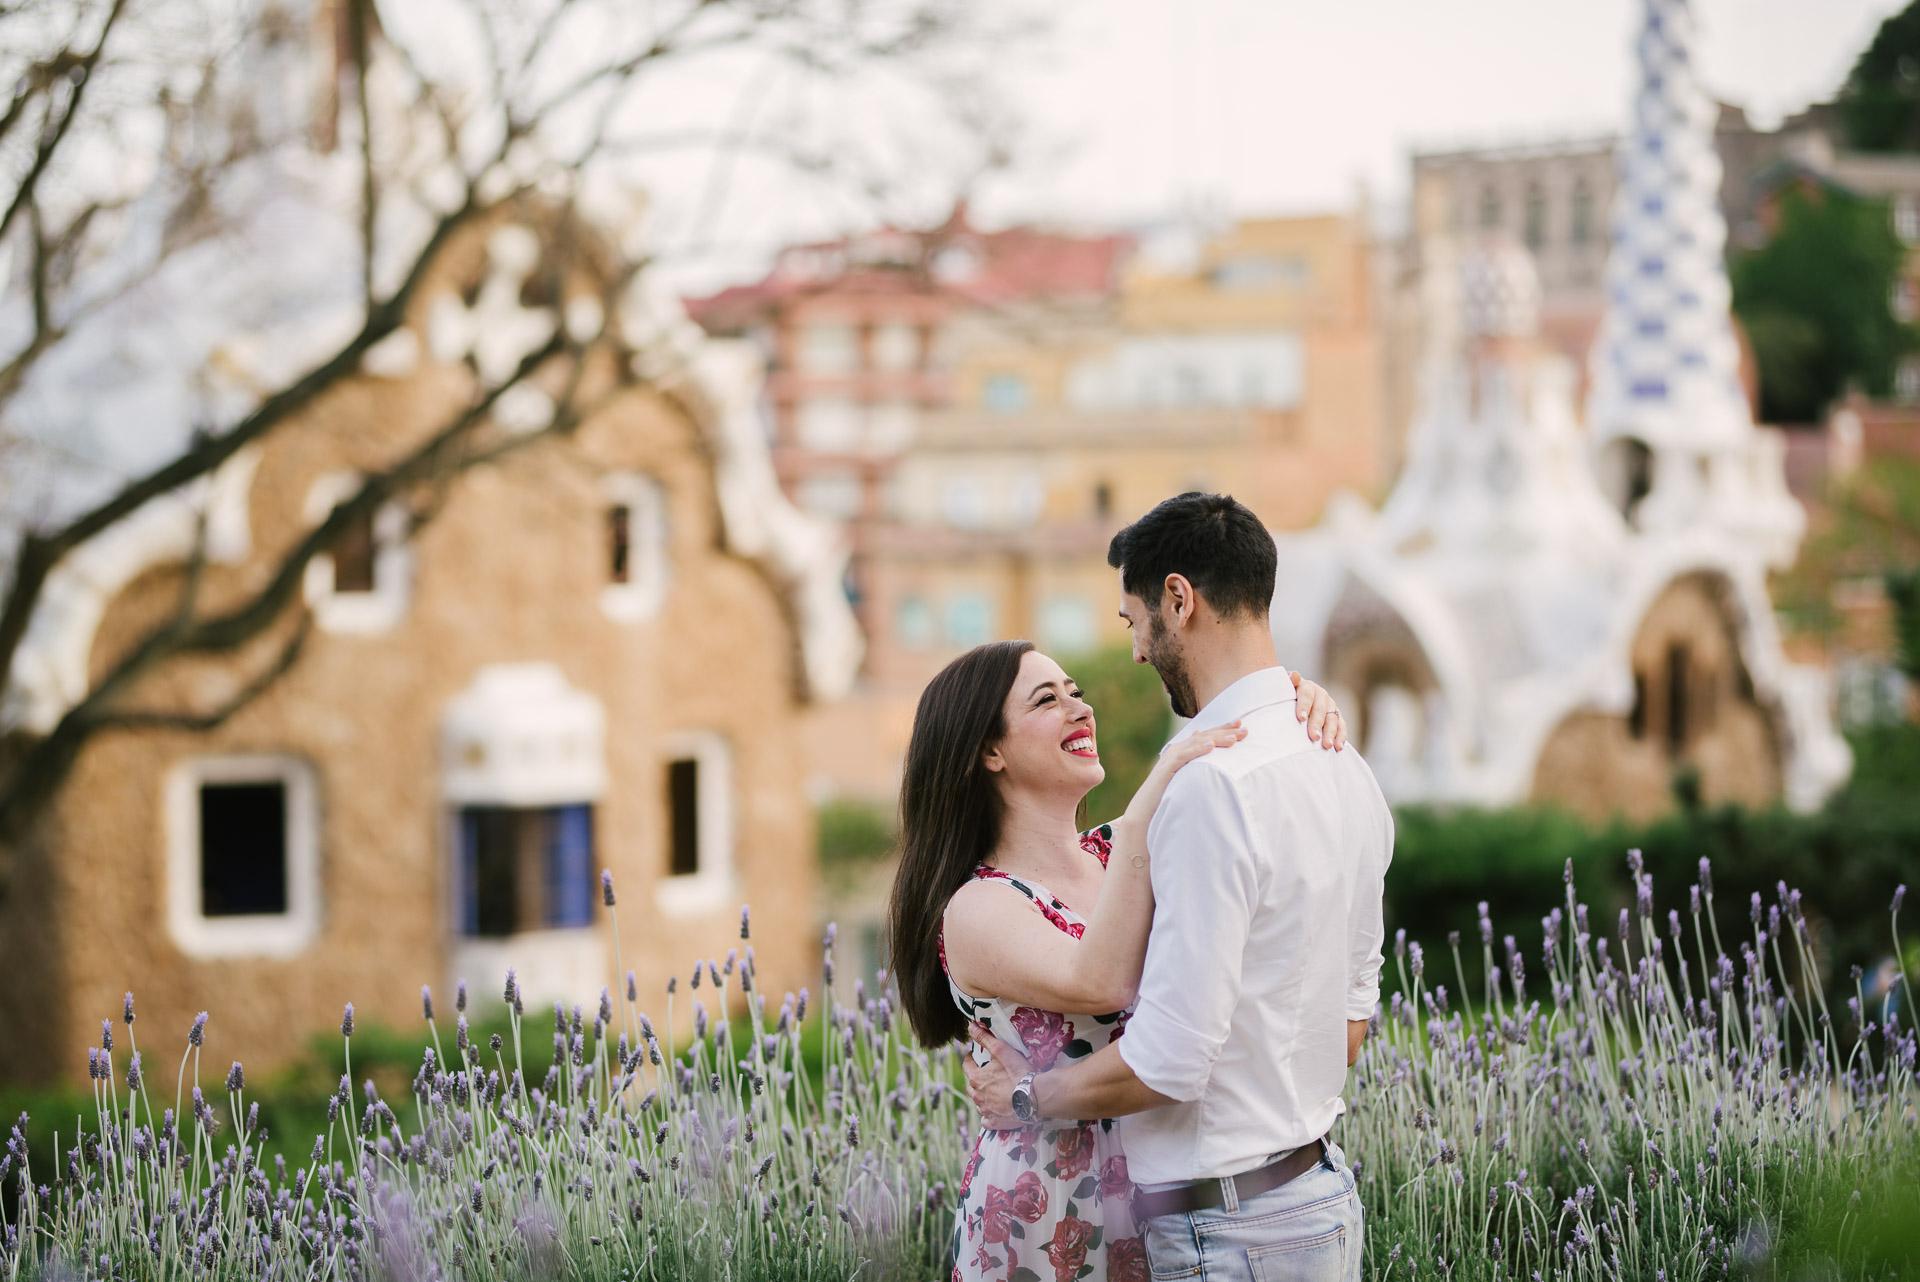 MoiraAlbert-mamaphoto-engagementsession-barcelona-114